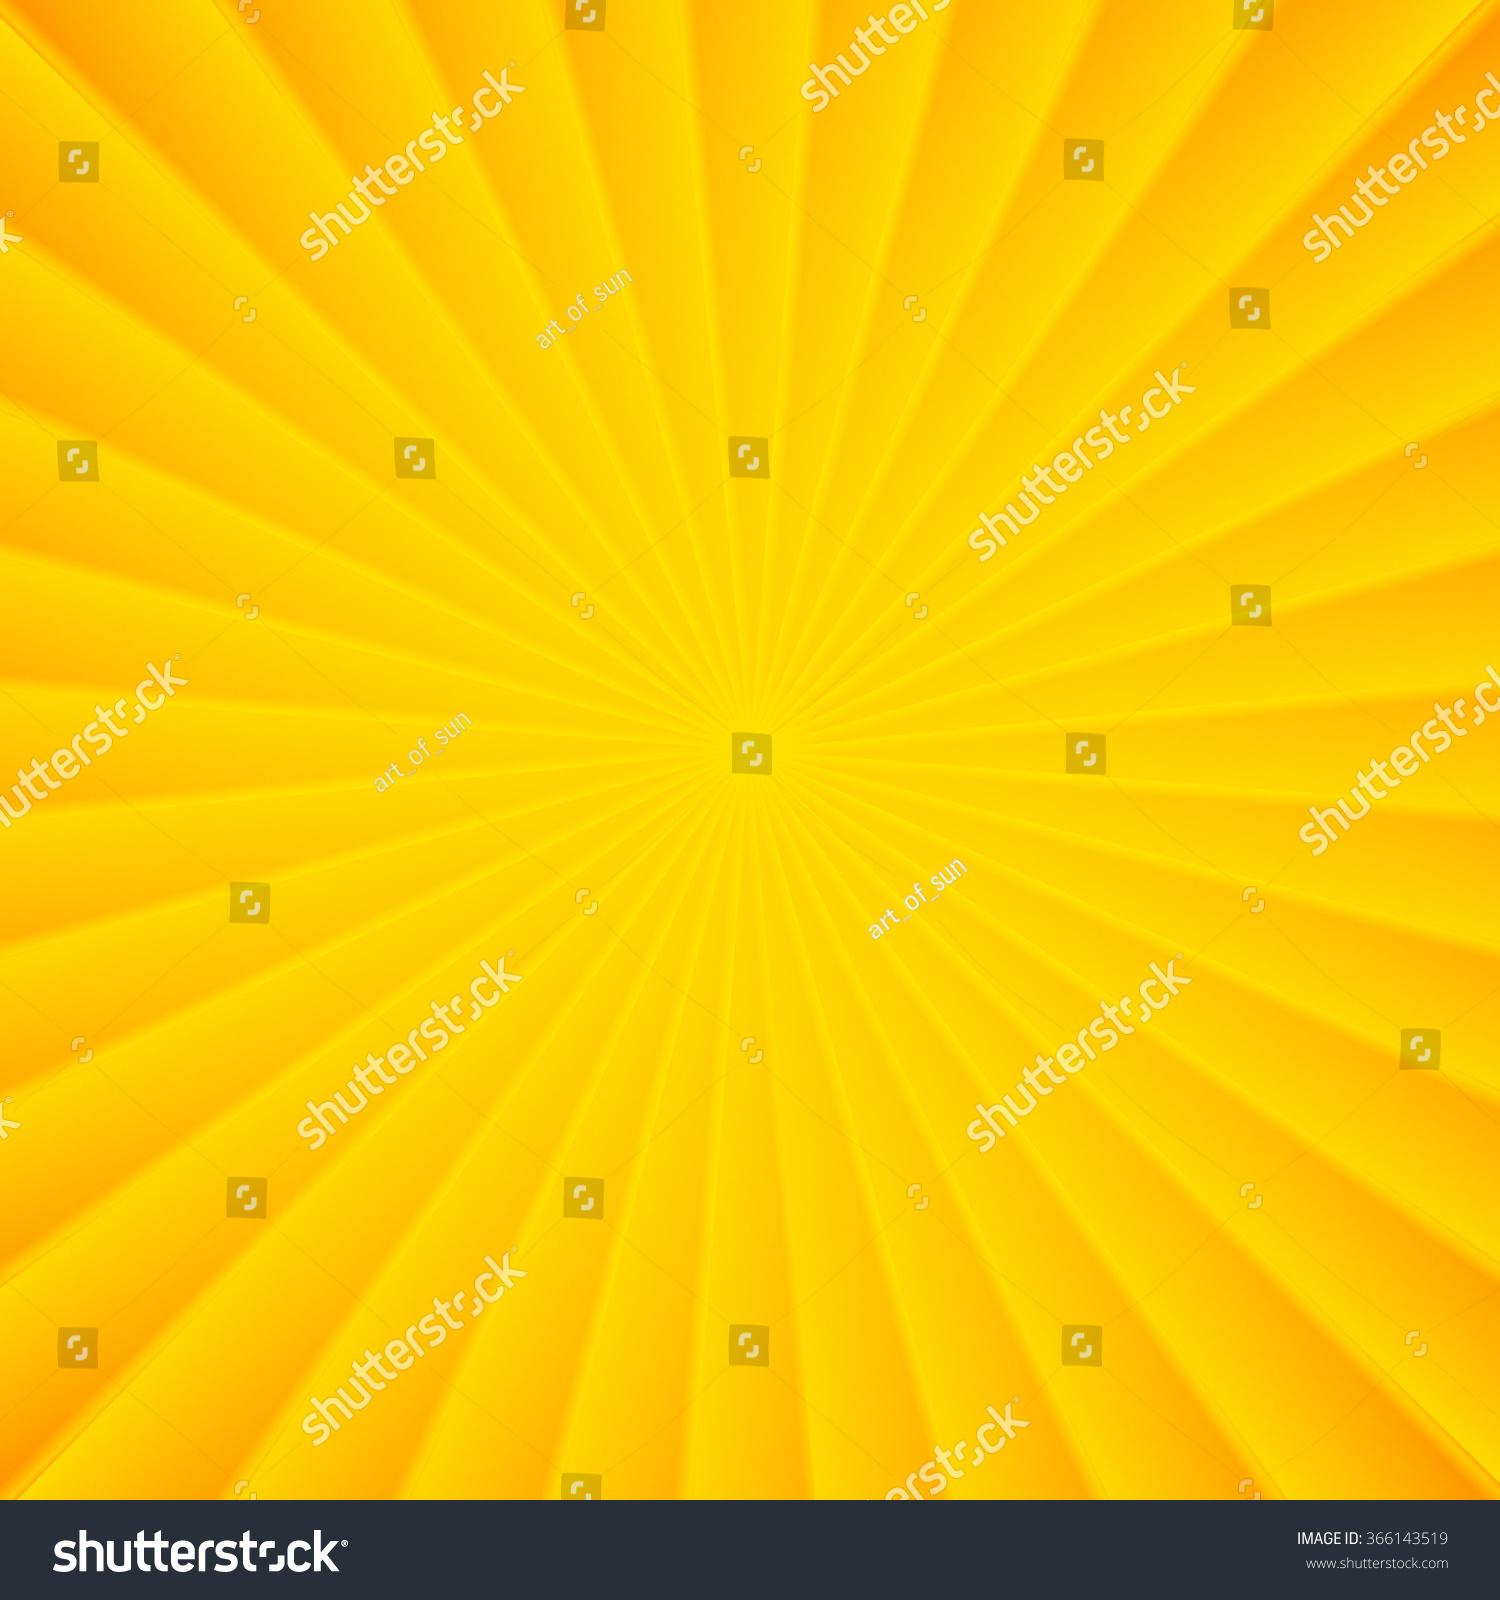 yellow rays vector - photo #24